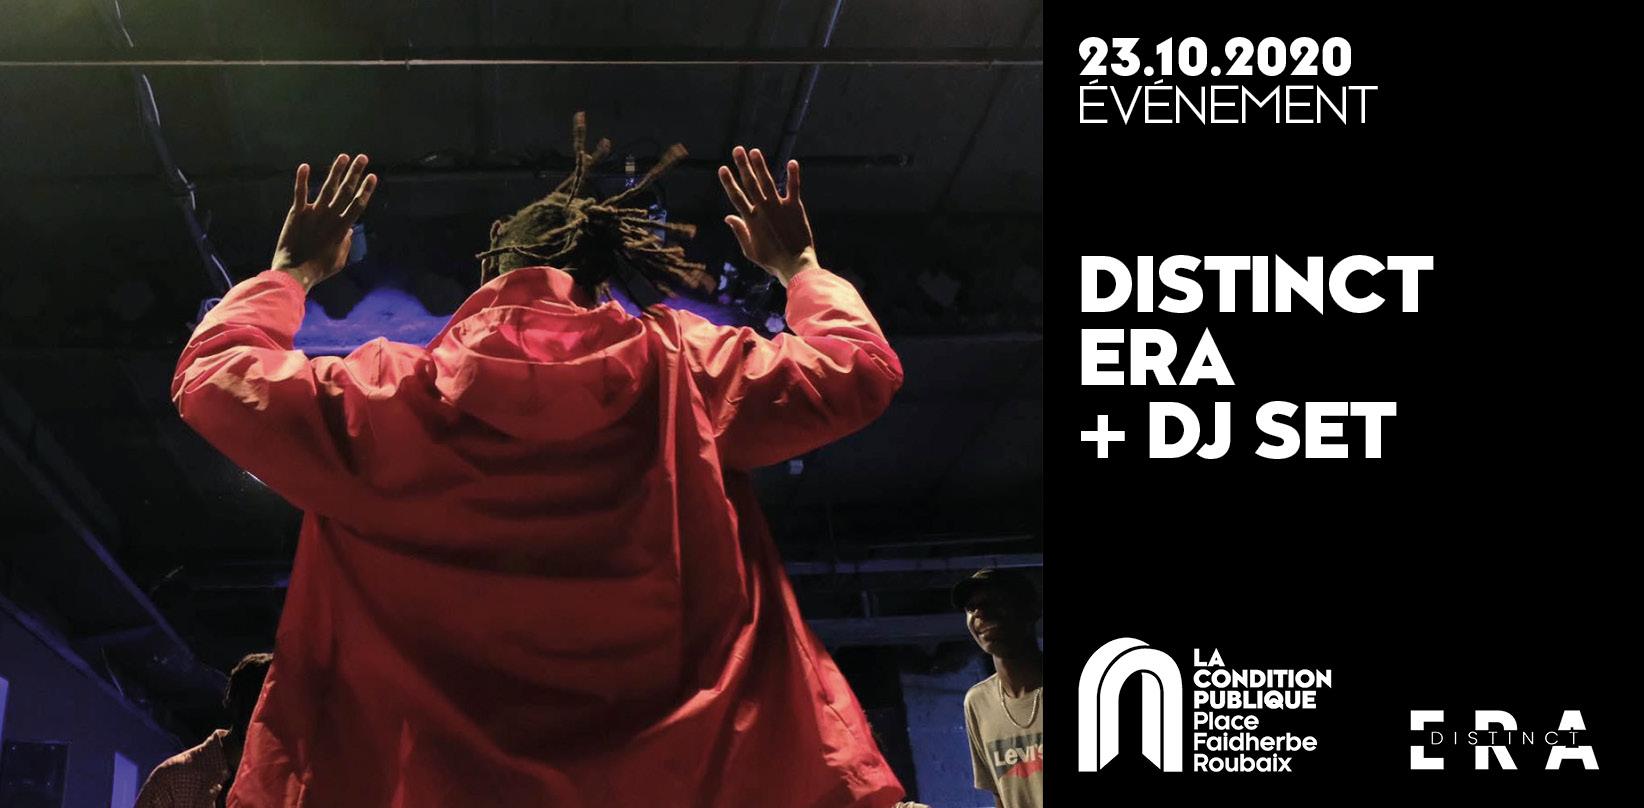 Soirée hip-hop Distinct Era